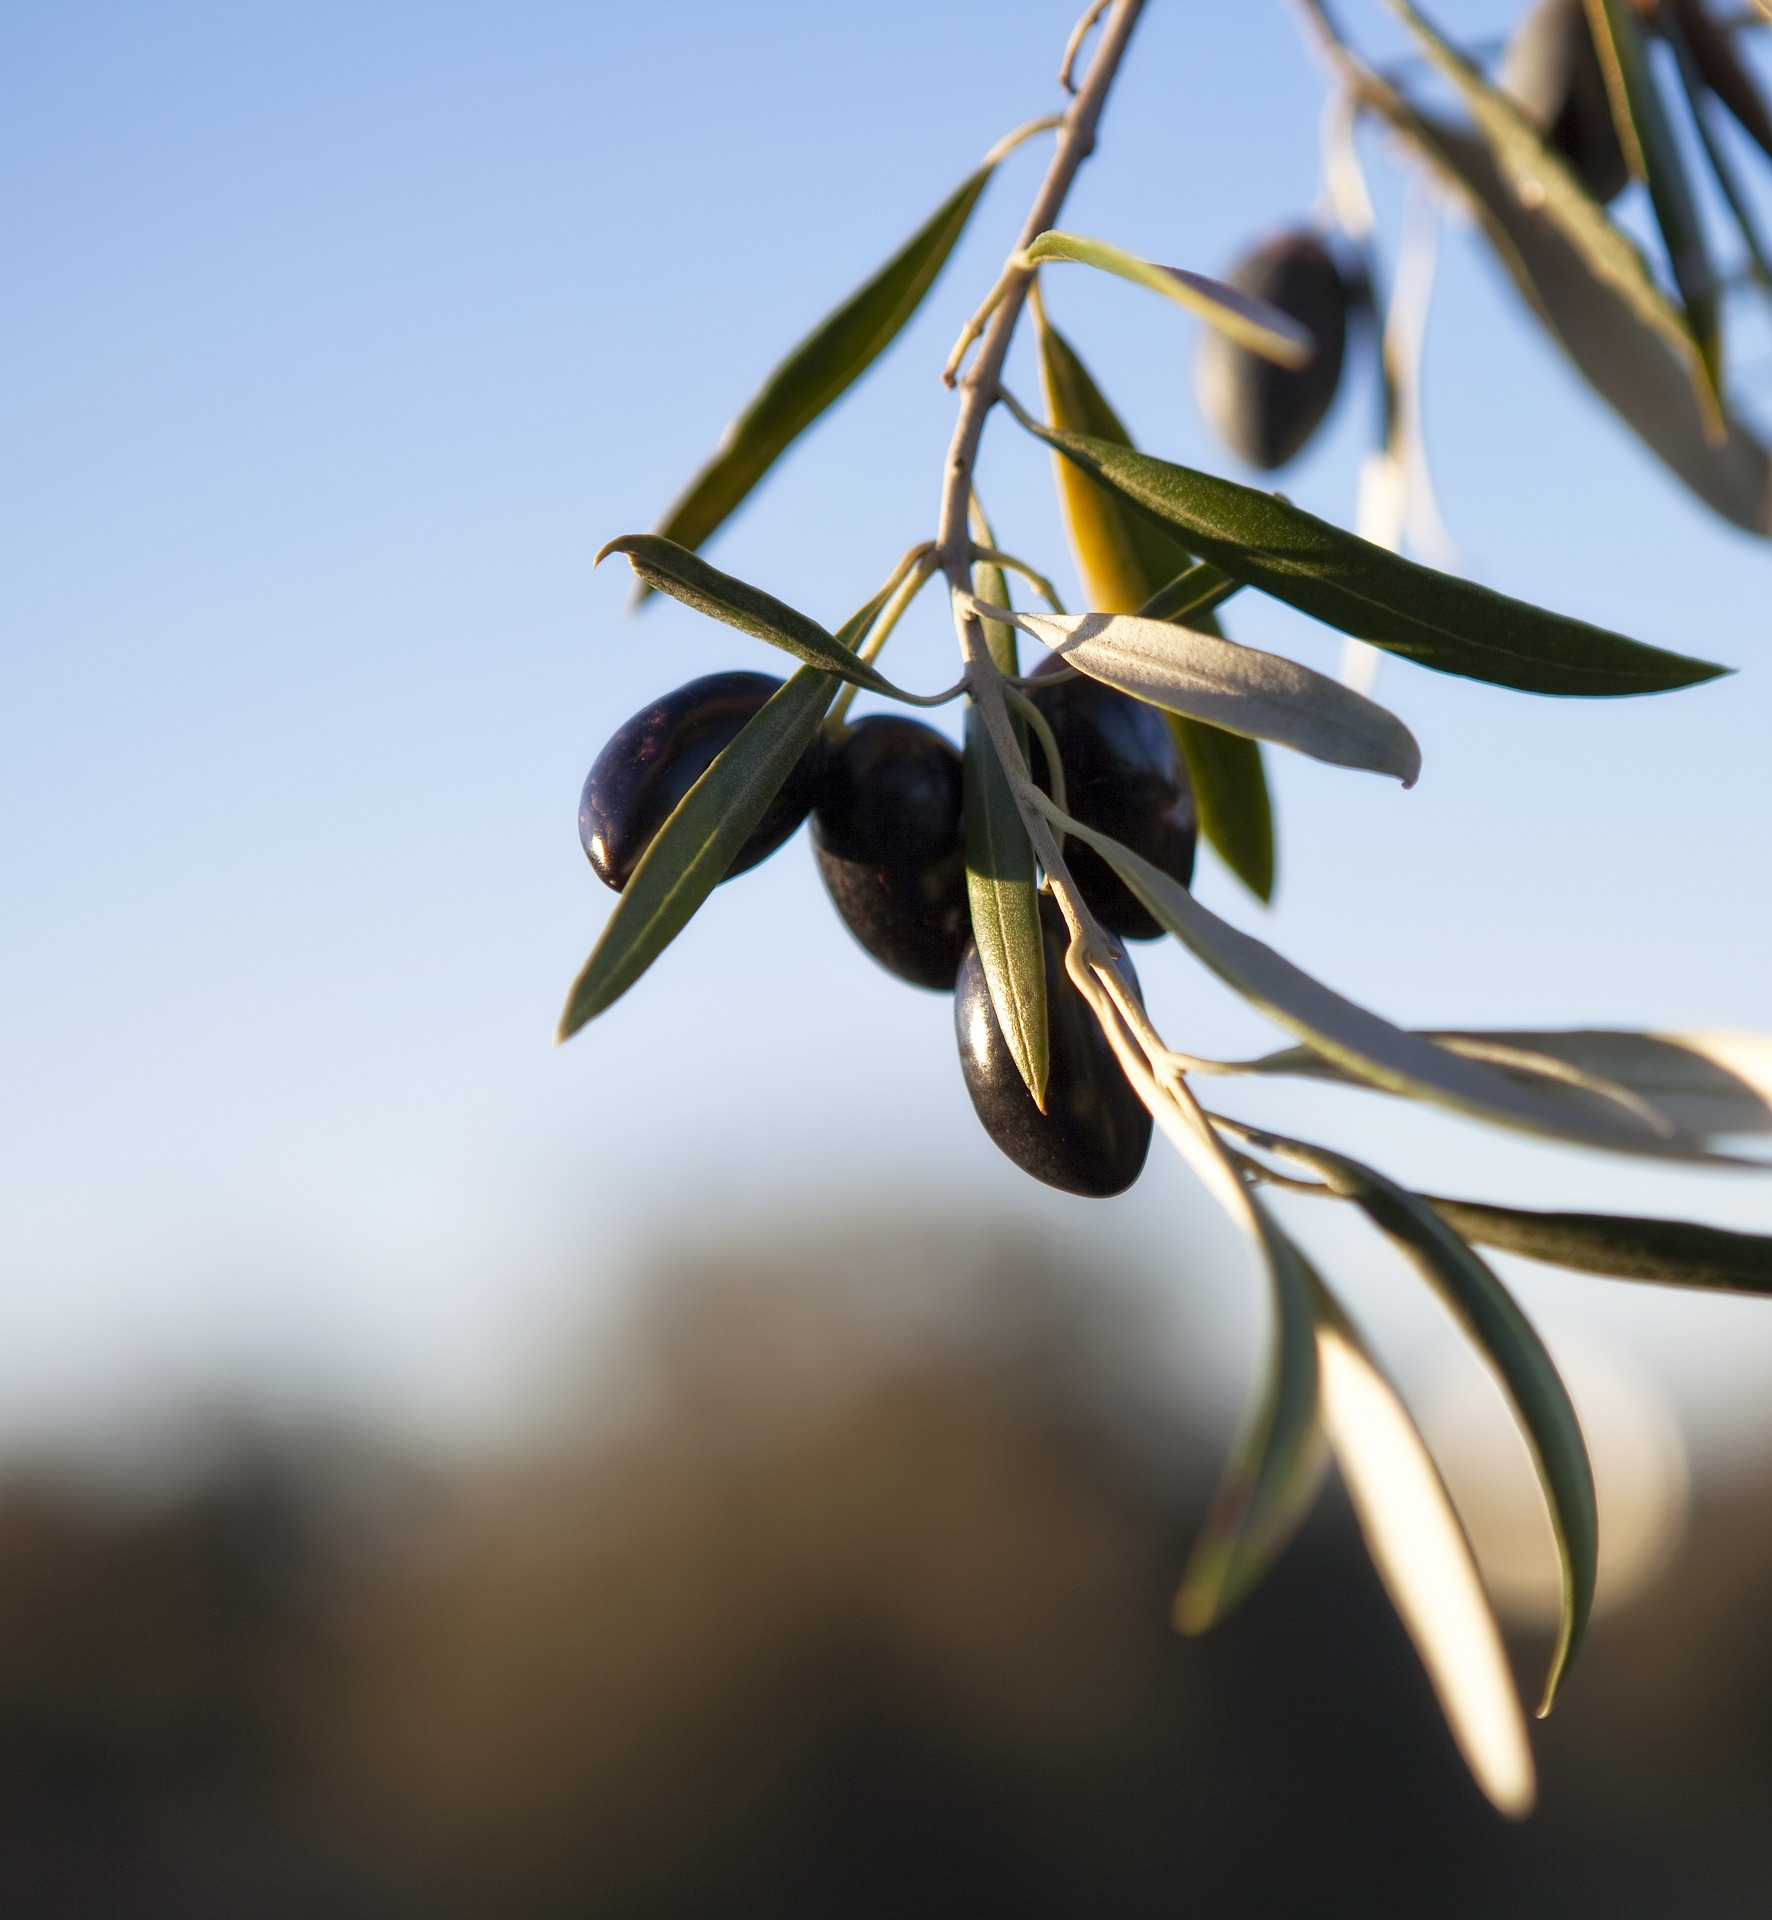 Apoyo al cultivo del olivo